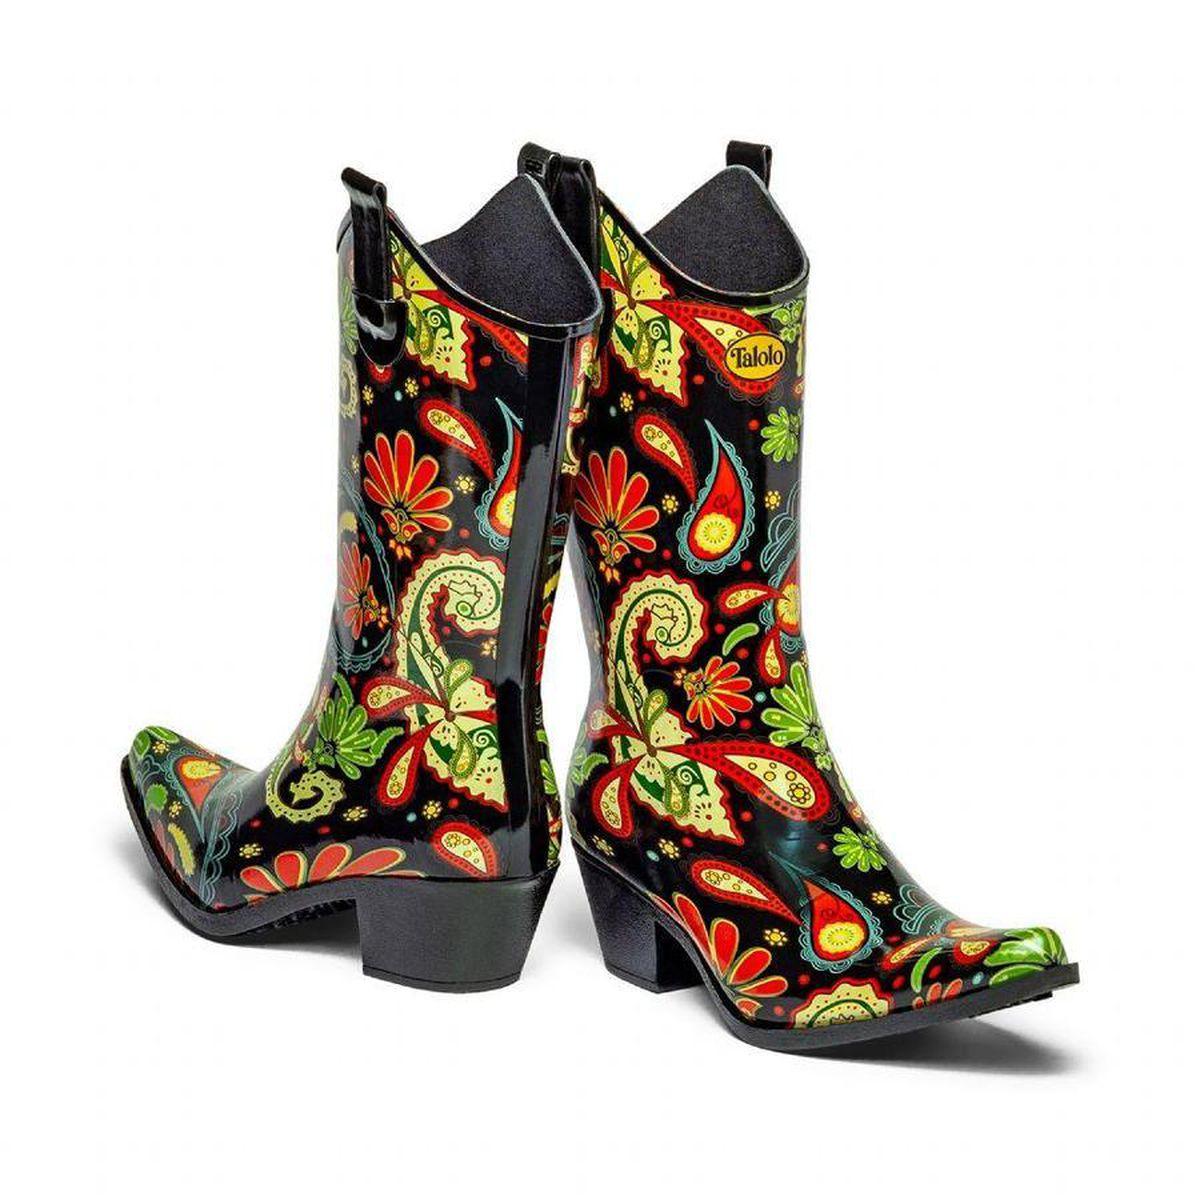 Talolo Paisley Vibe Cowboy Boot Wellies